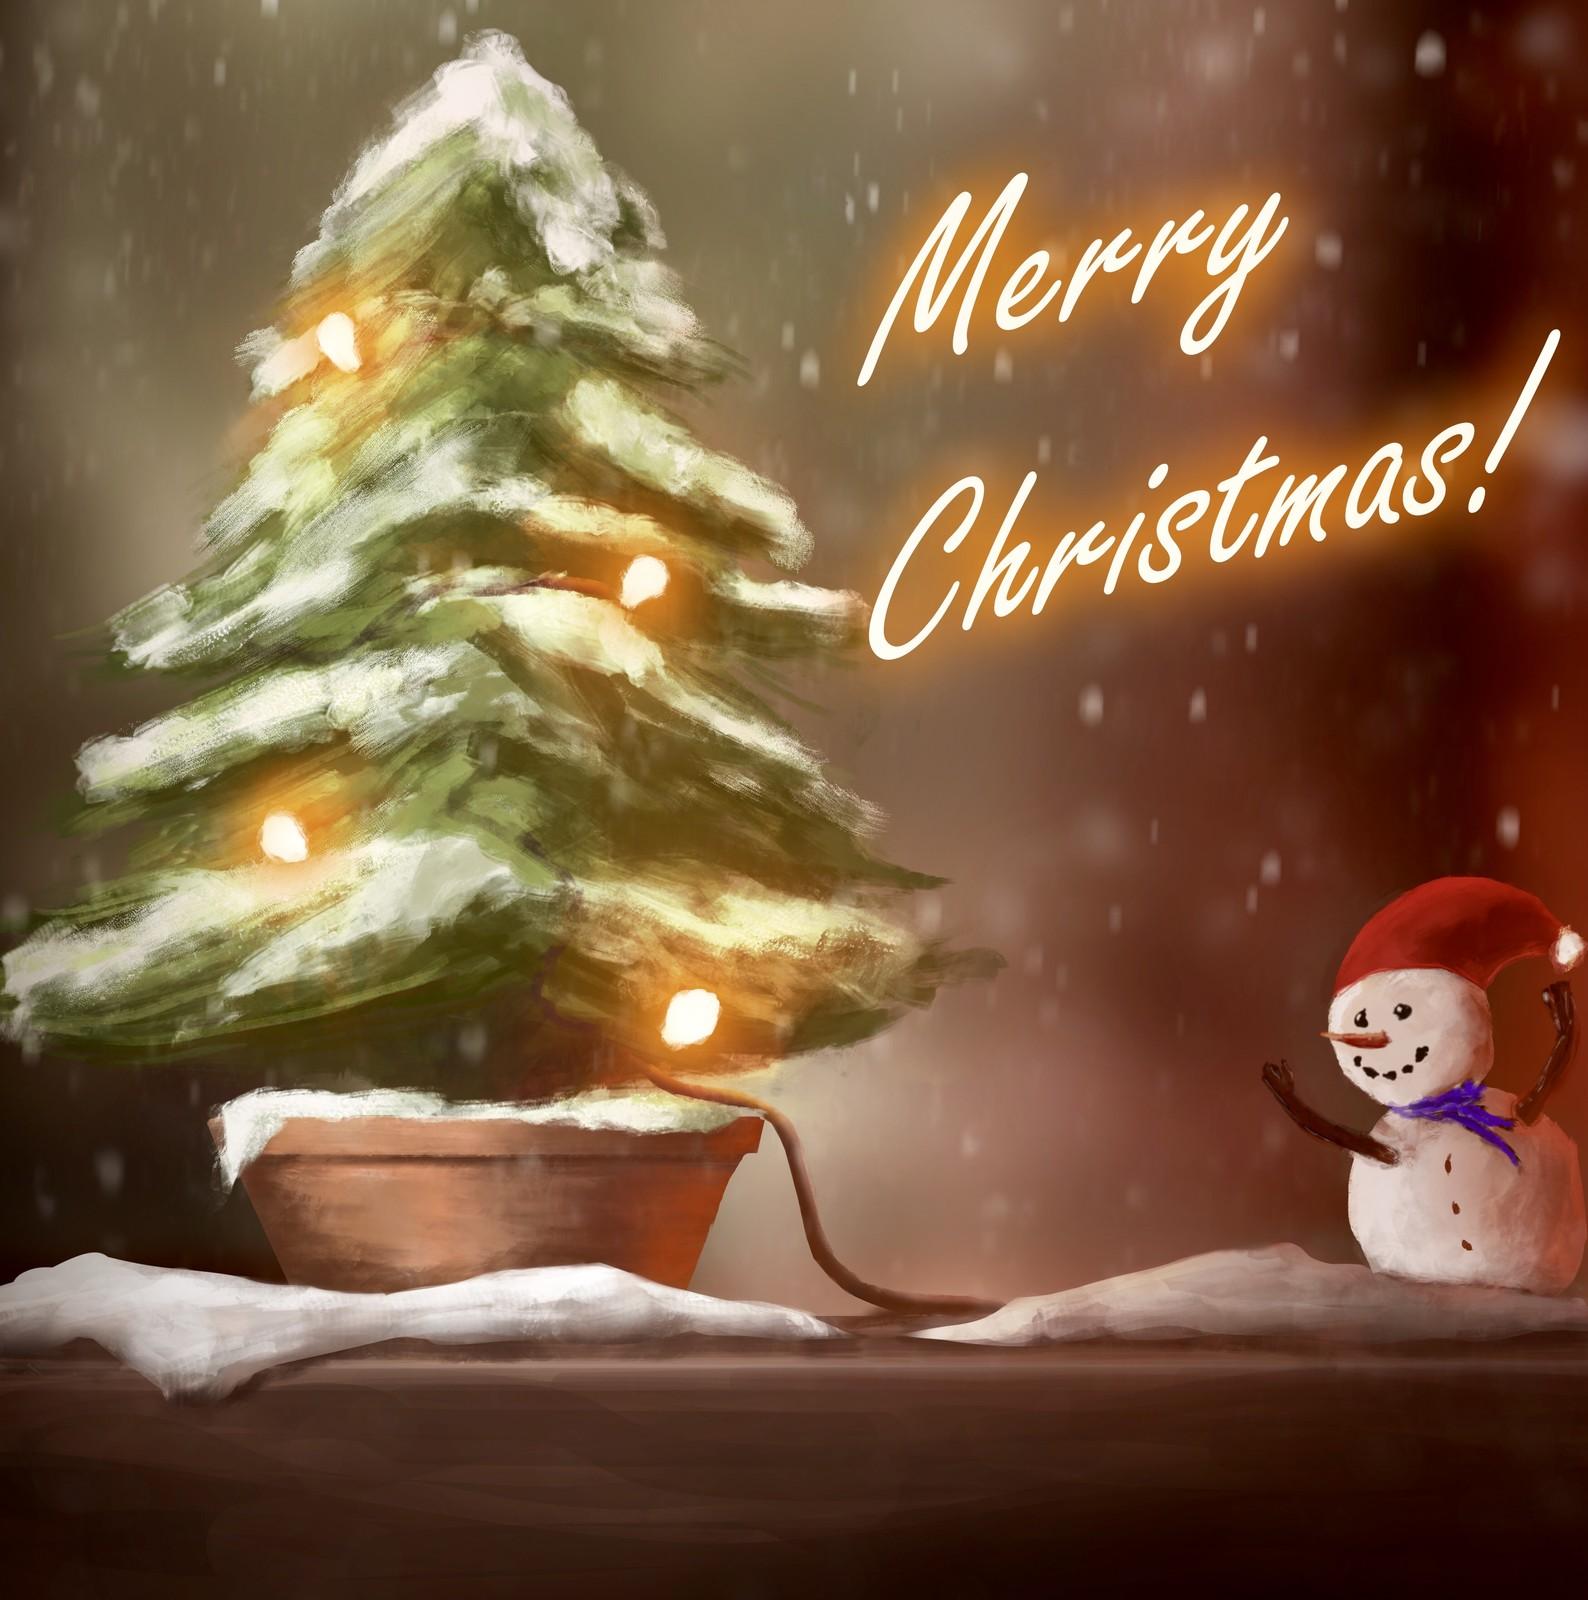 Merry Christmas 2018!! :)